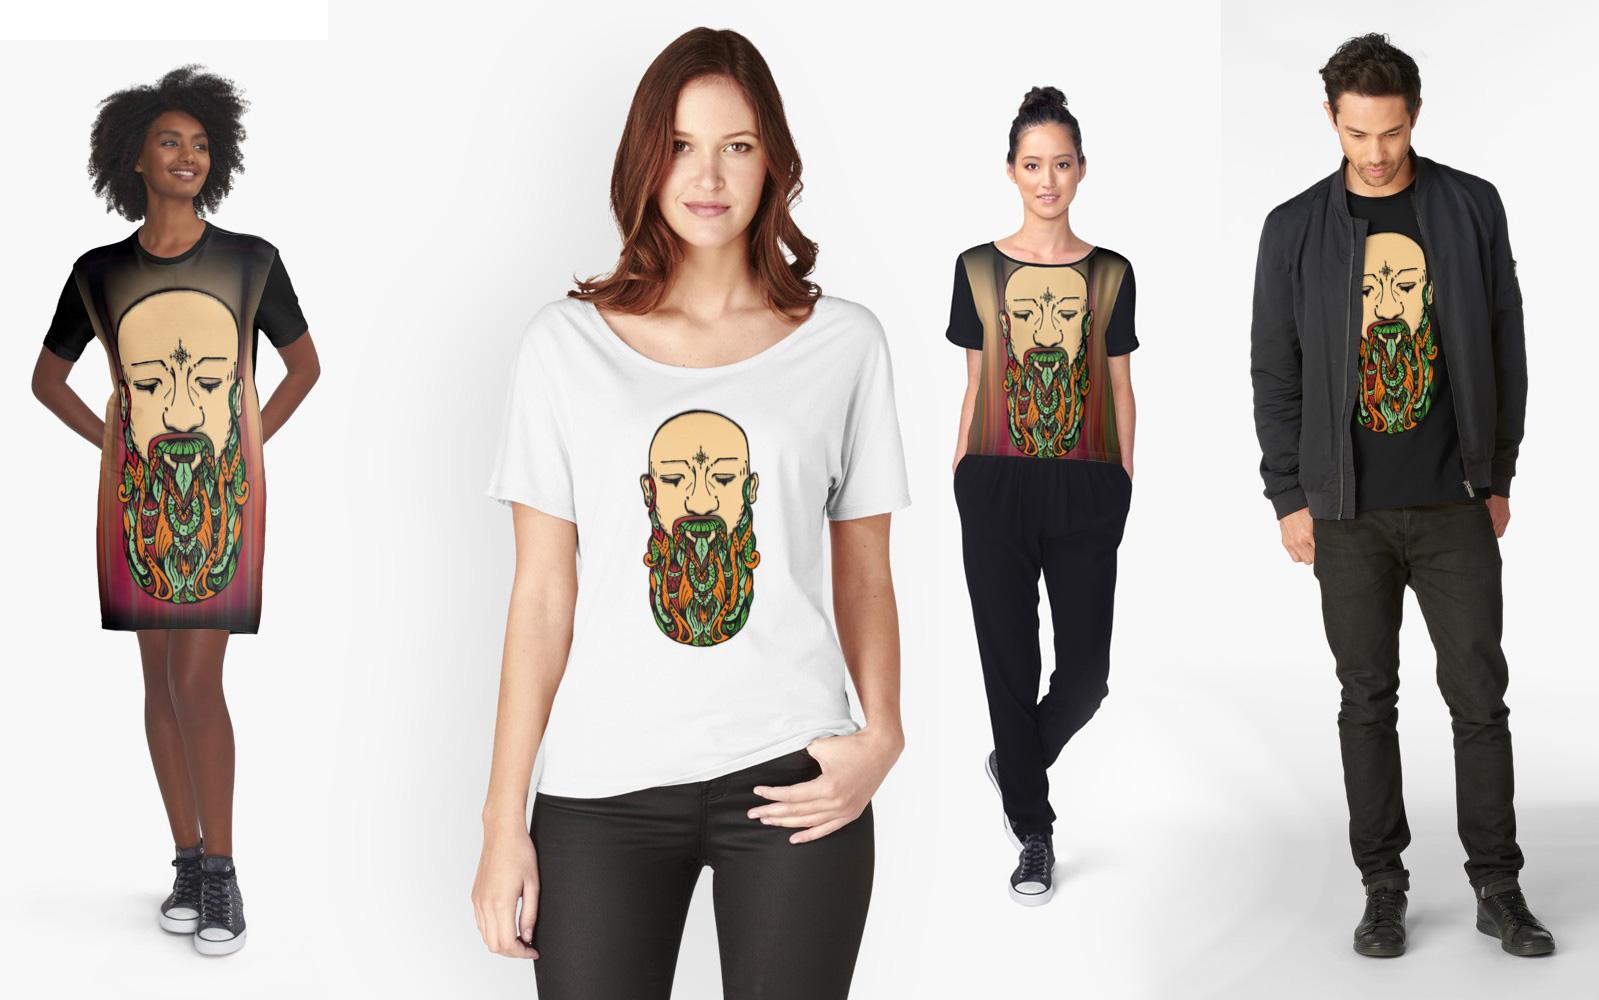 Beard abundance, art print disponible para Redbubble